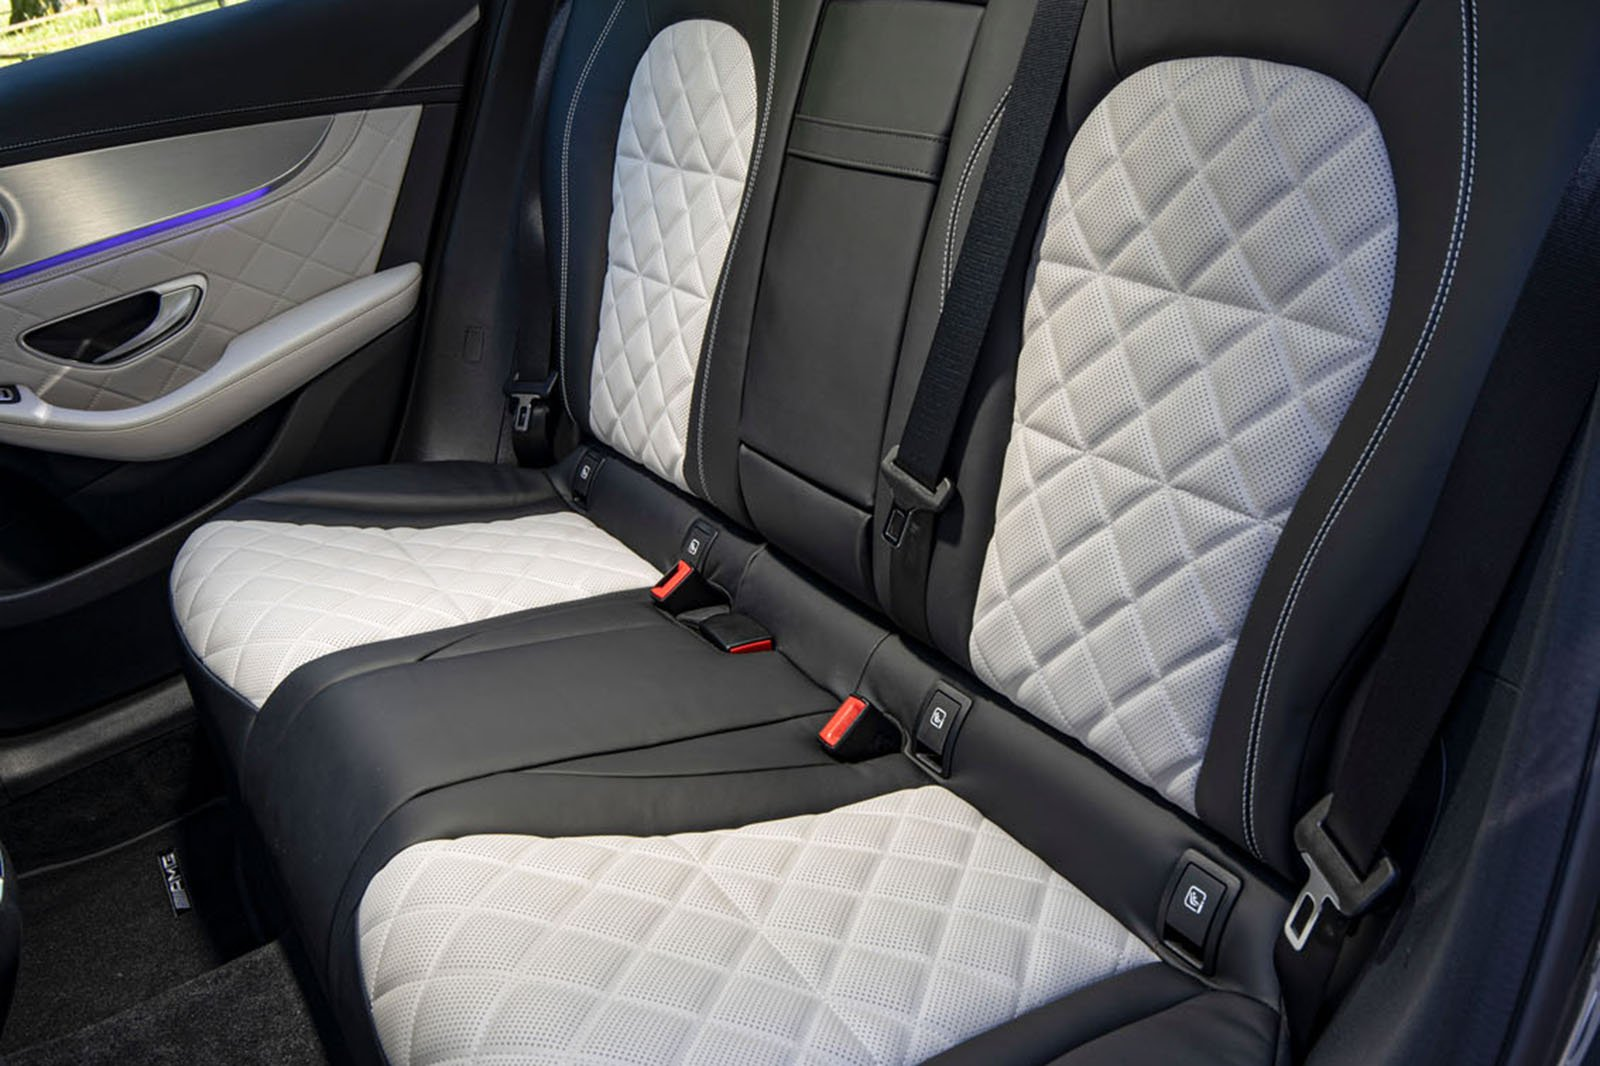 Mercedes GLC 2019 facelift rear seats